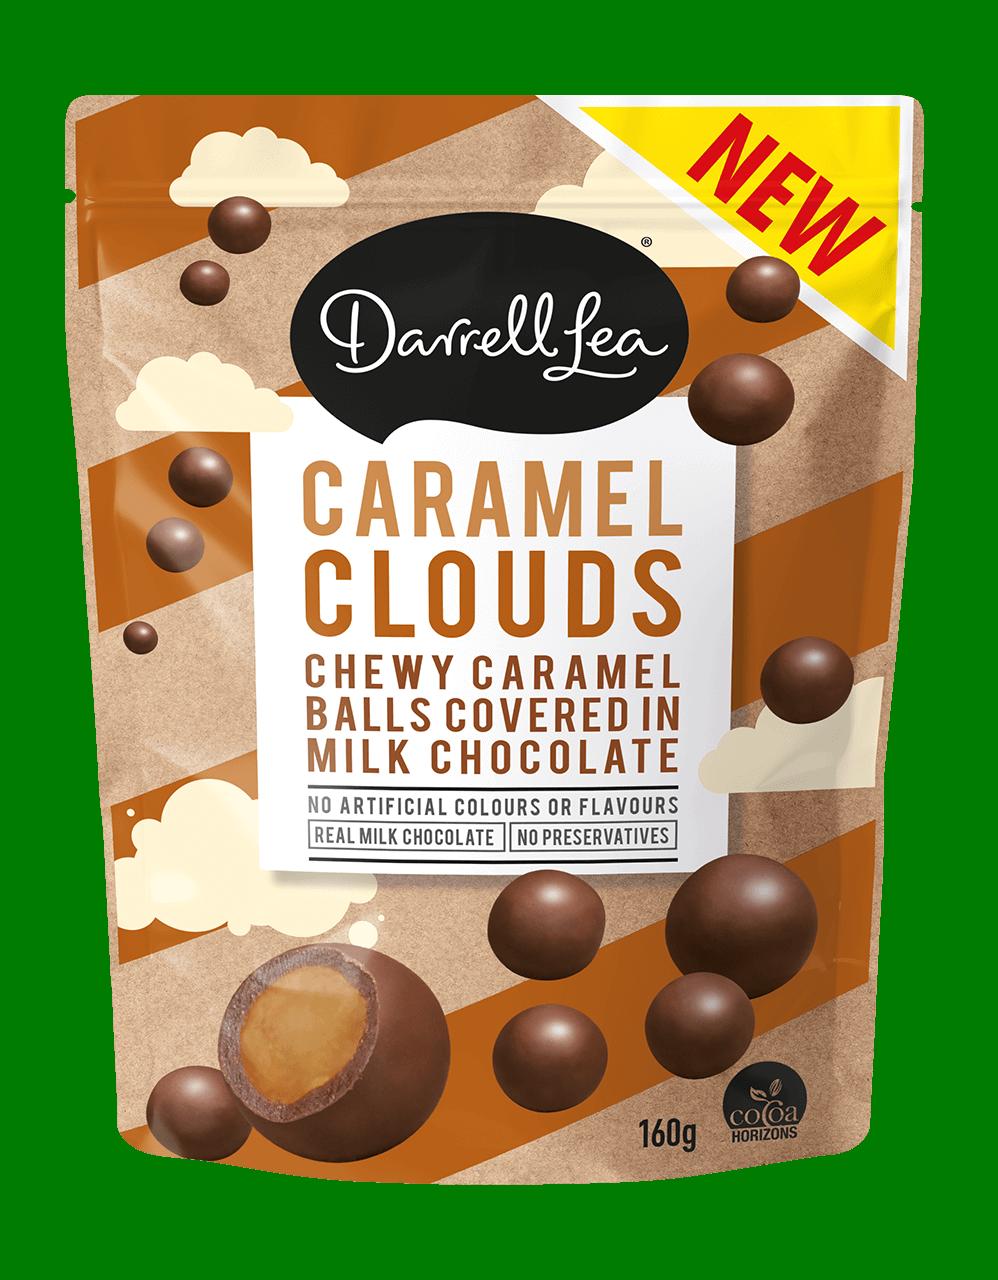 Image of Caramel Clouds 160G